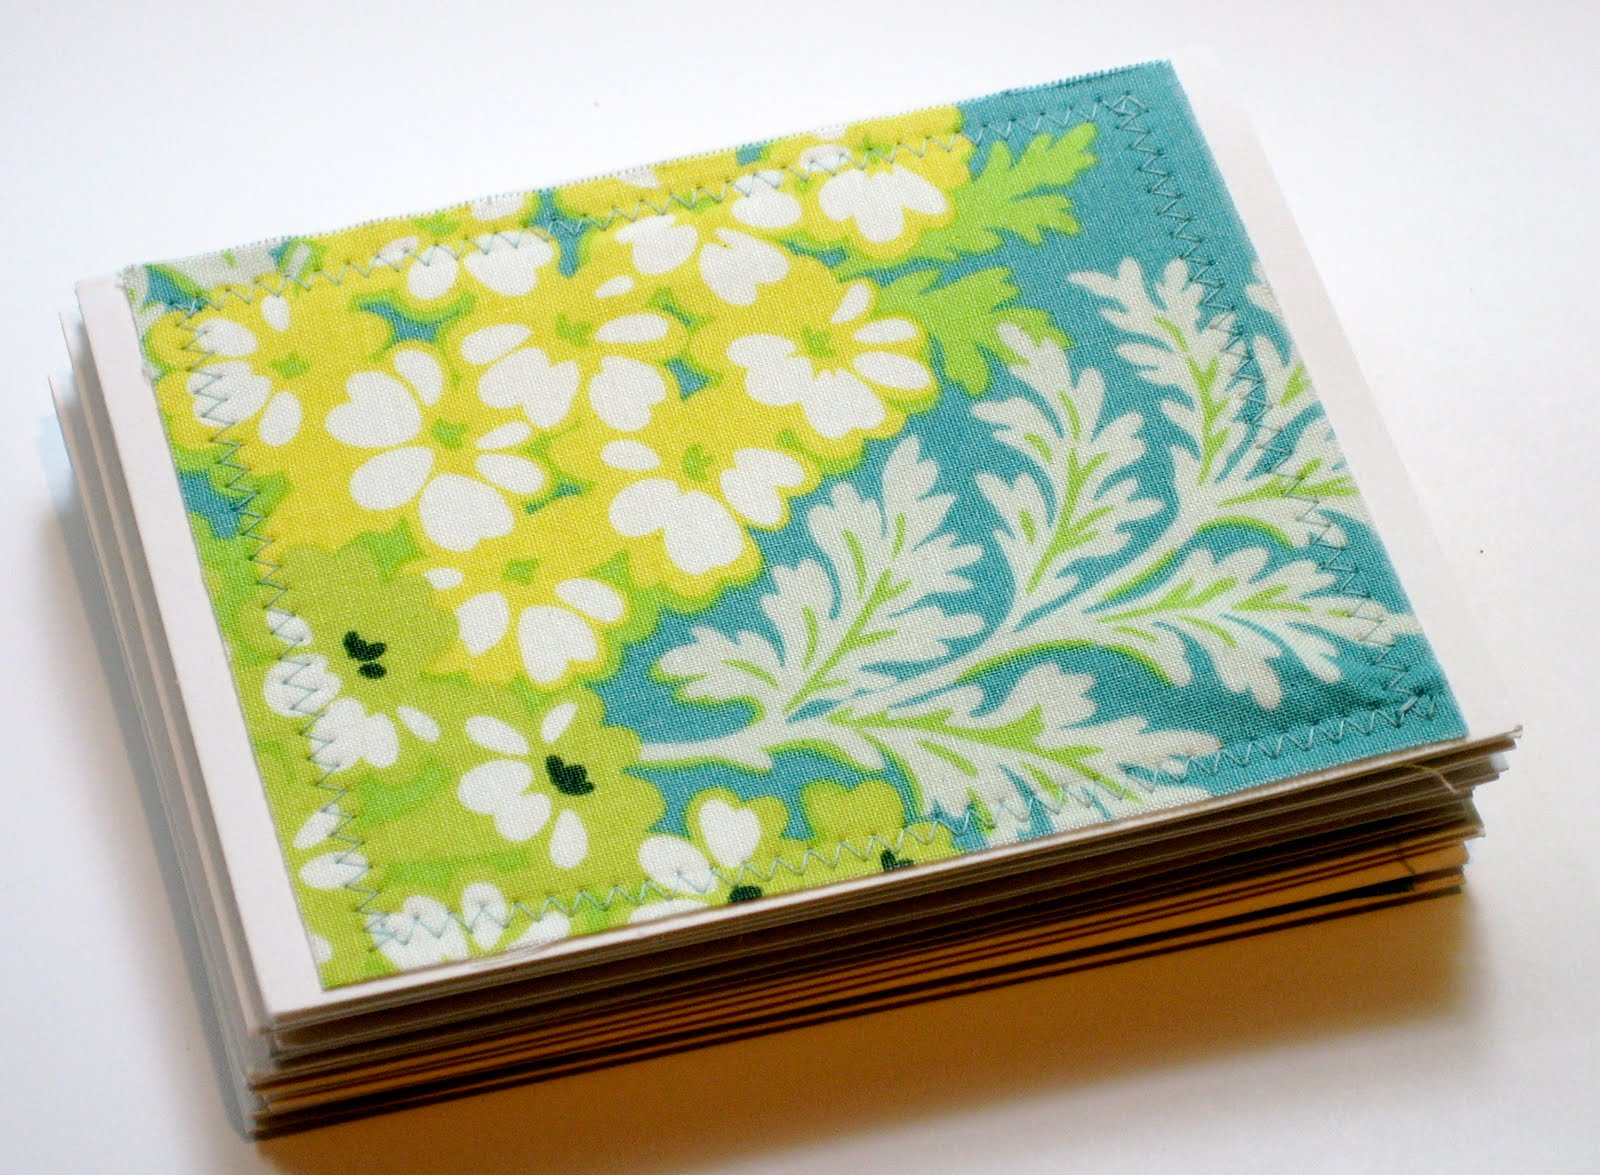 Office Interior Design Image: Summer Garden Birthday Party - Fabric ...